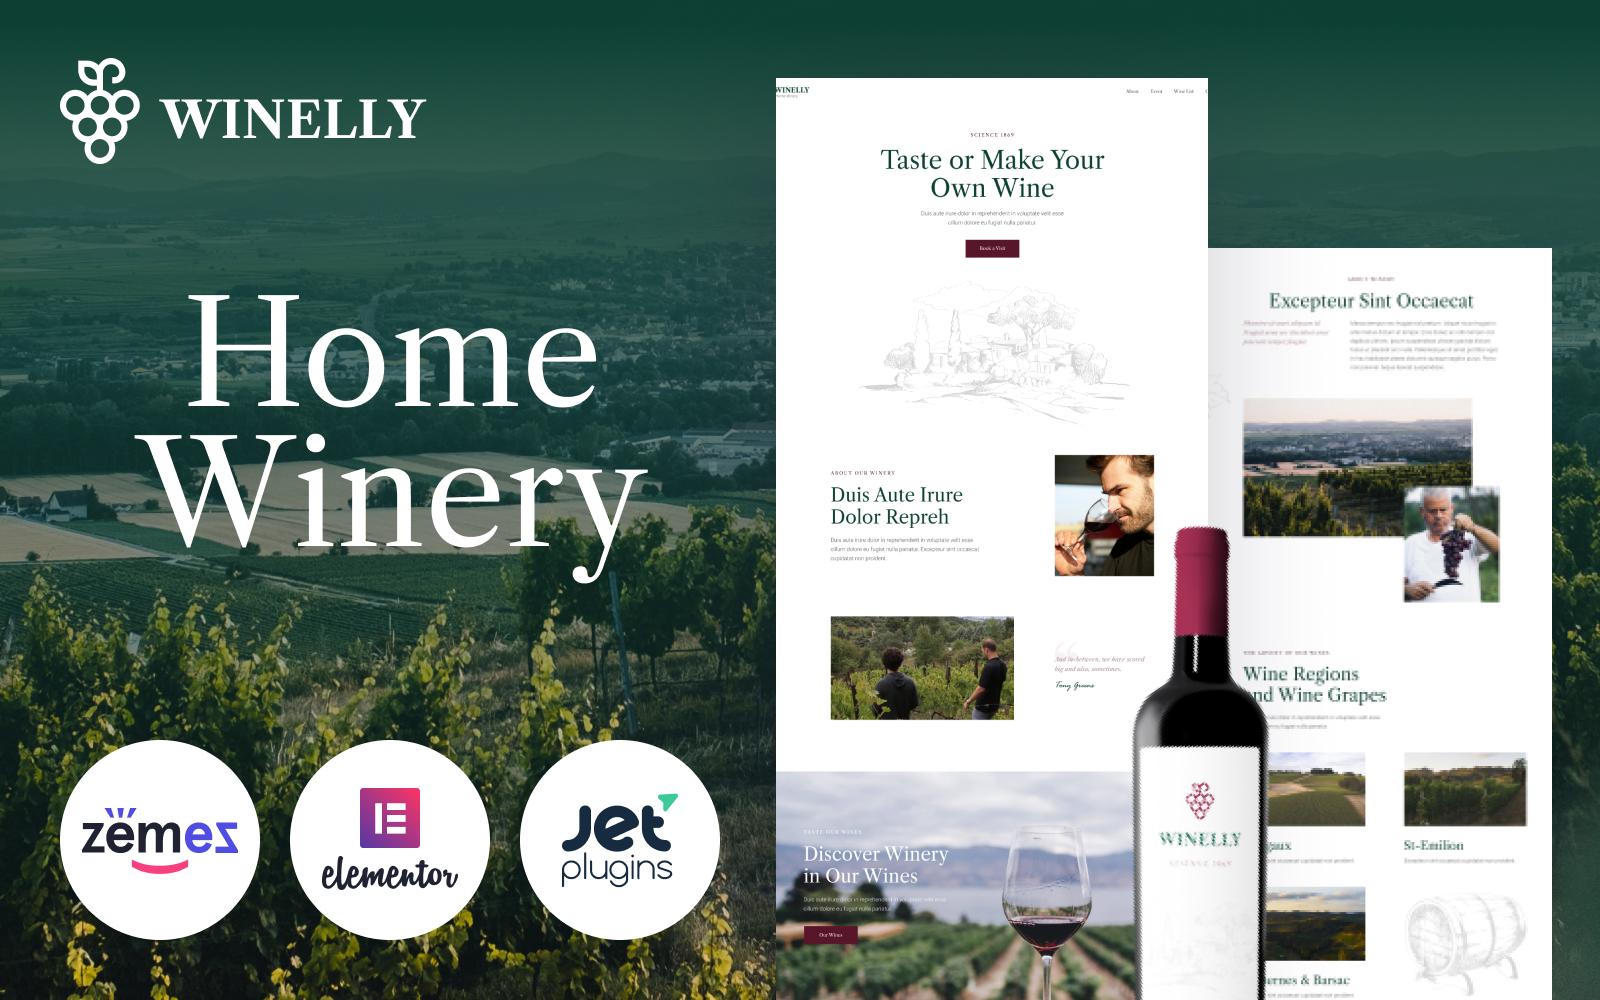 """Winelly - Wine Tasting Theme with Elementor"" 响应式WordPress模板 #95585"